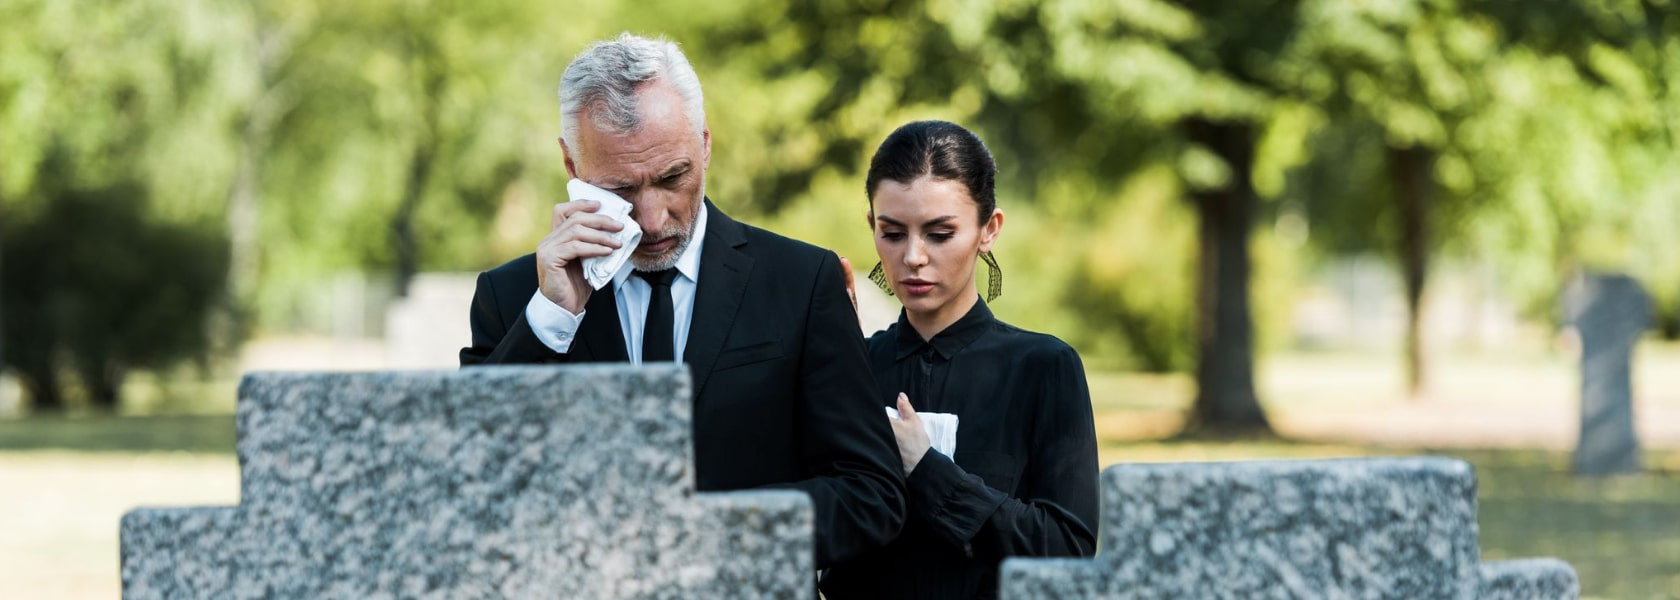 Galli onoranze funebri